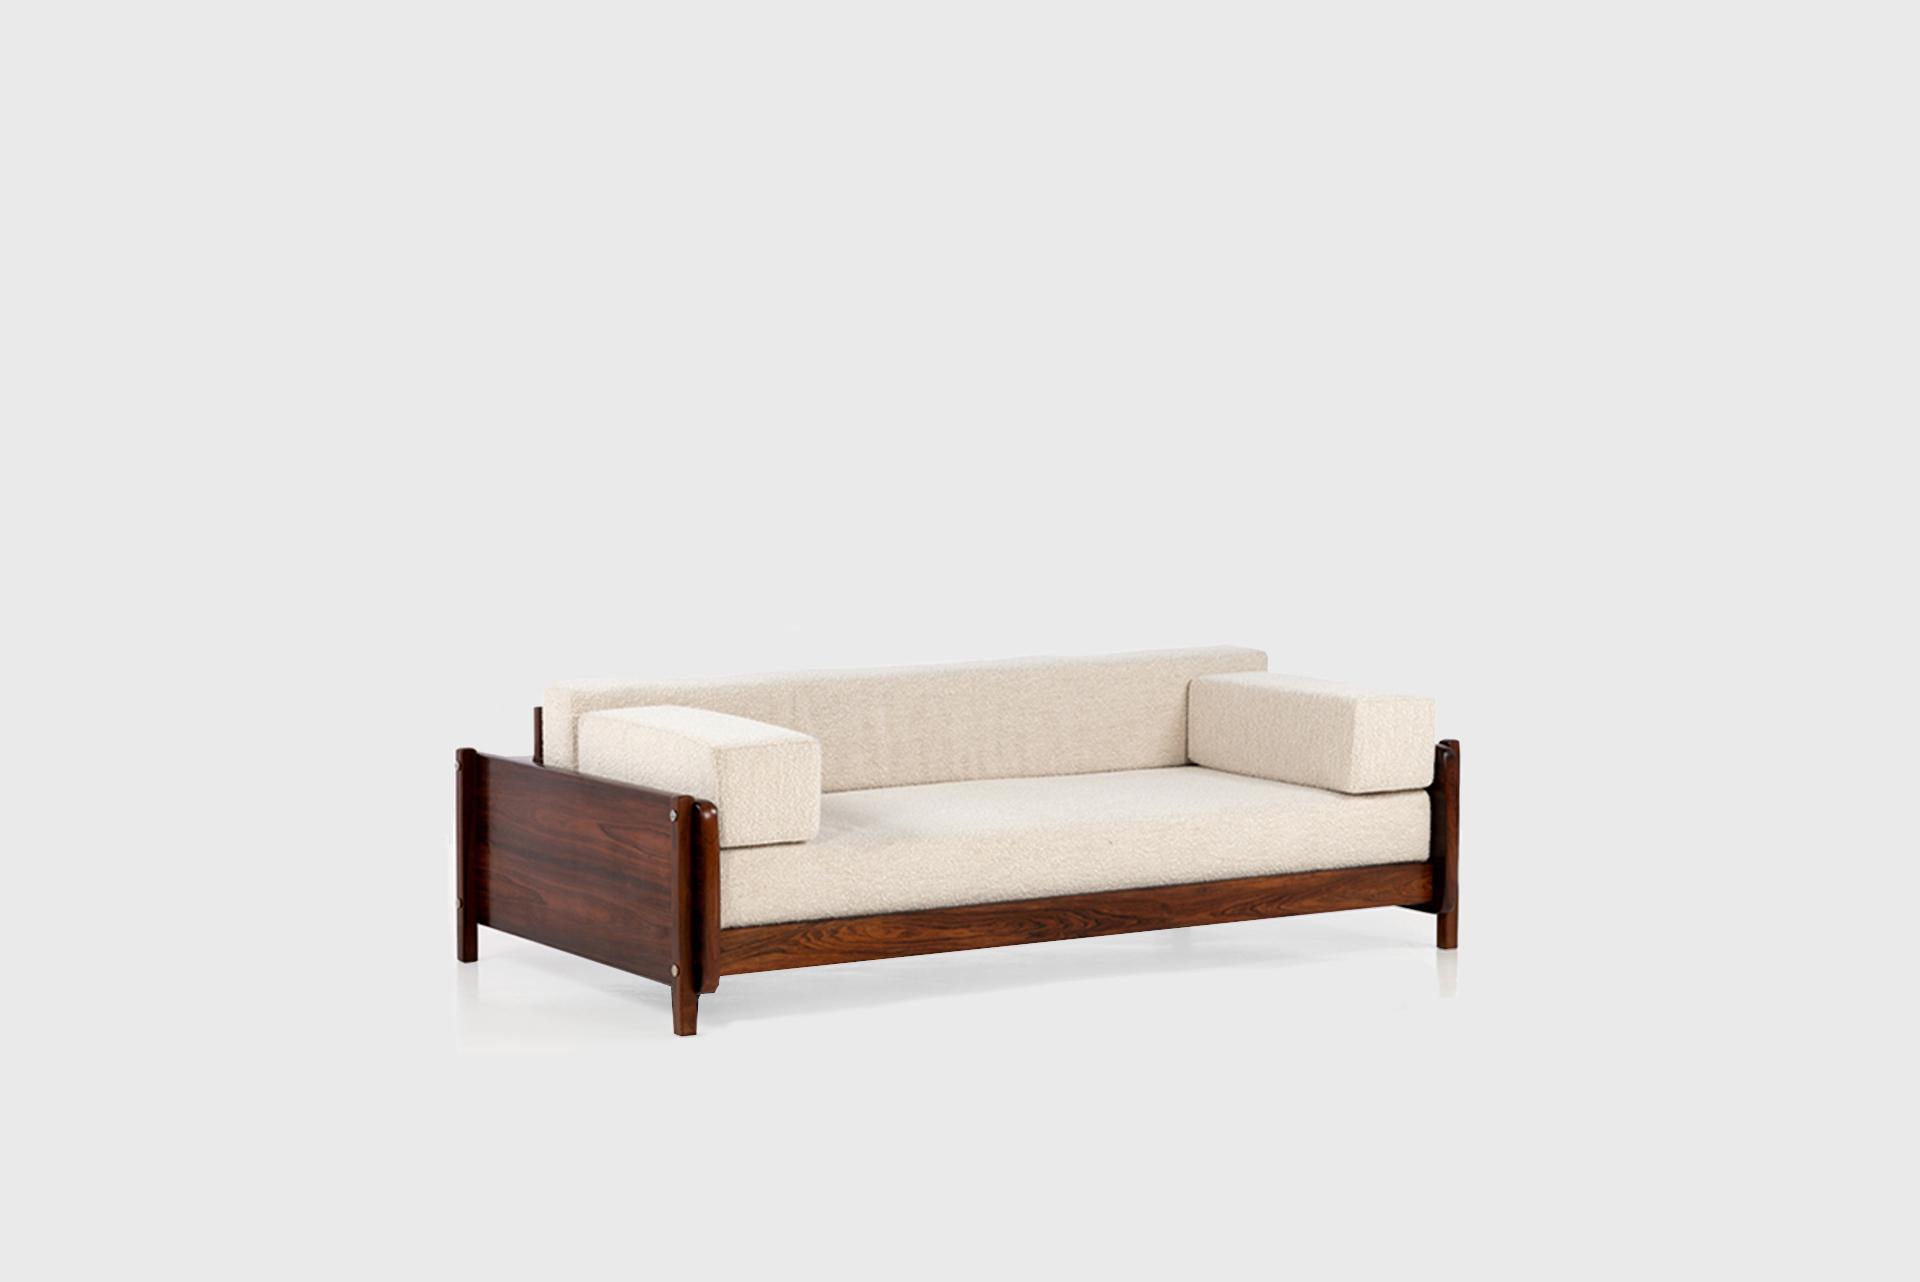 Sofa Manufactured by Oca Brazil, 1960 Imbuia wood, fabric upholstery